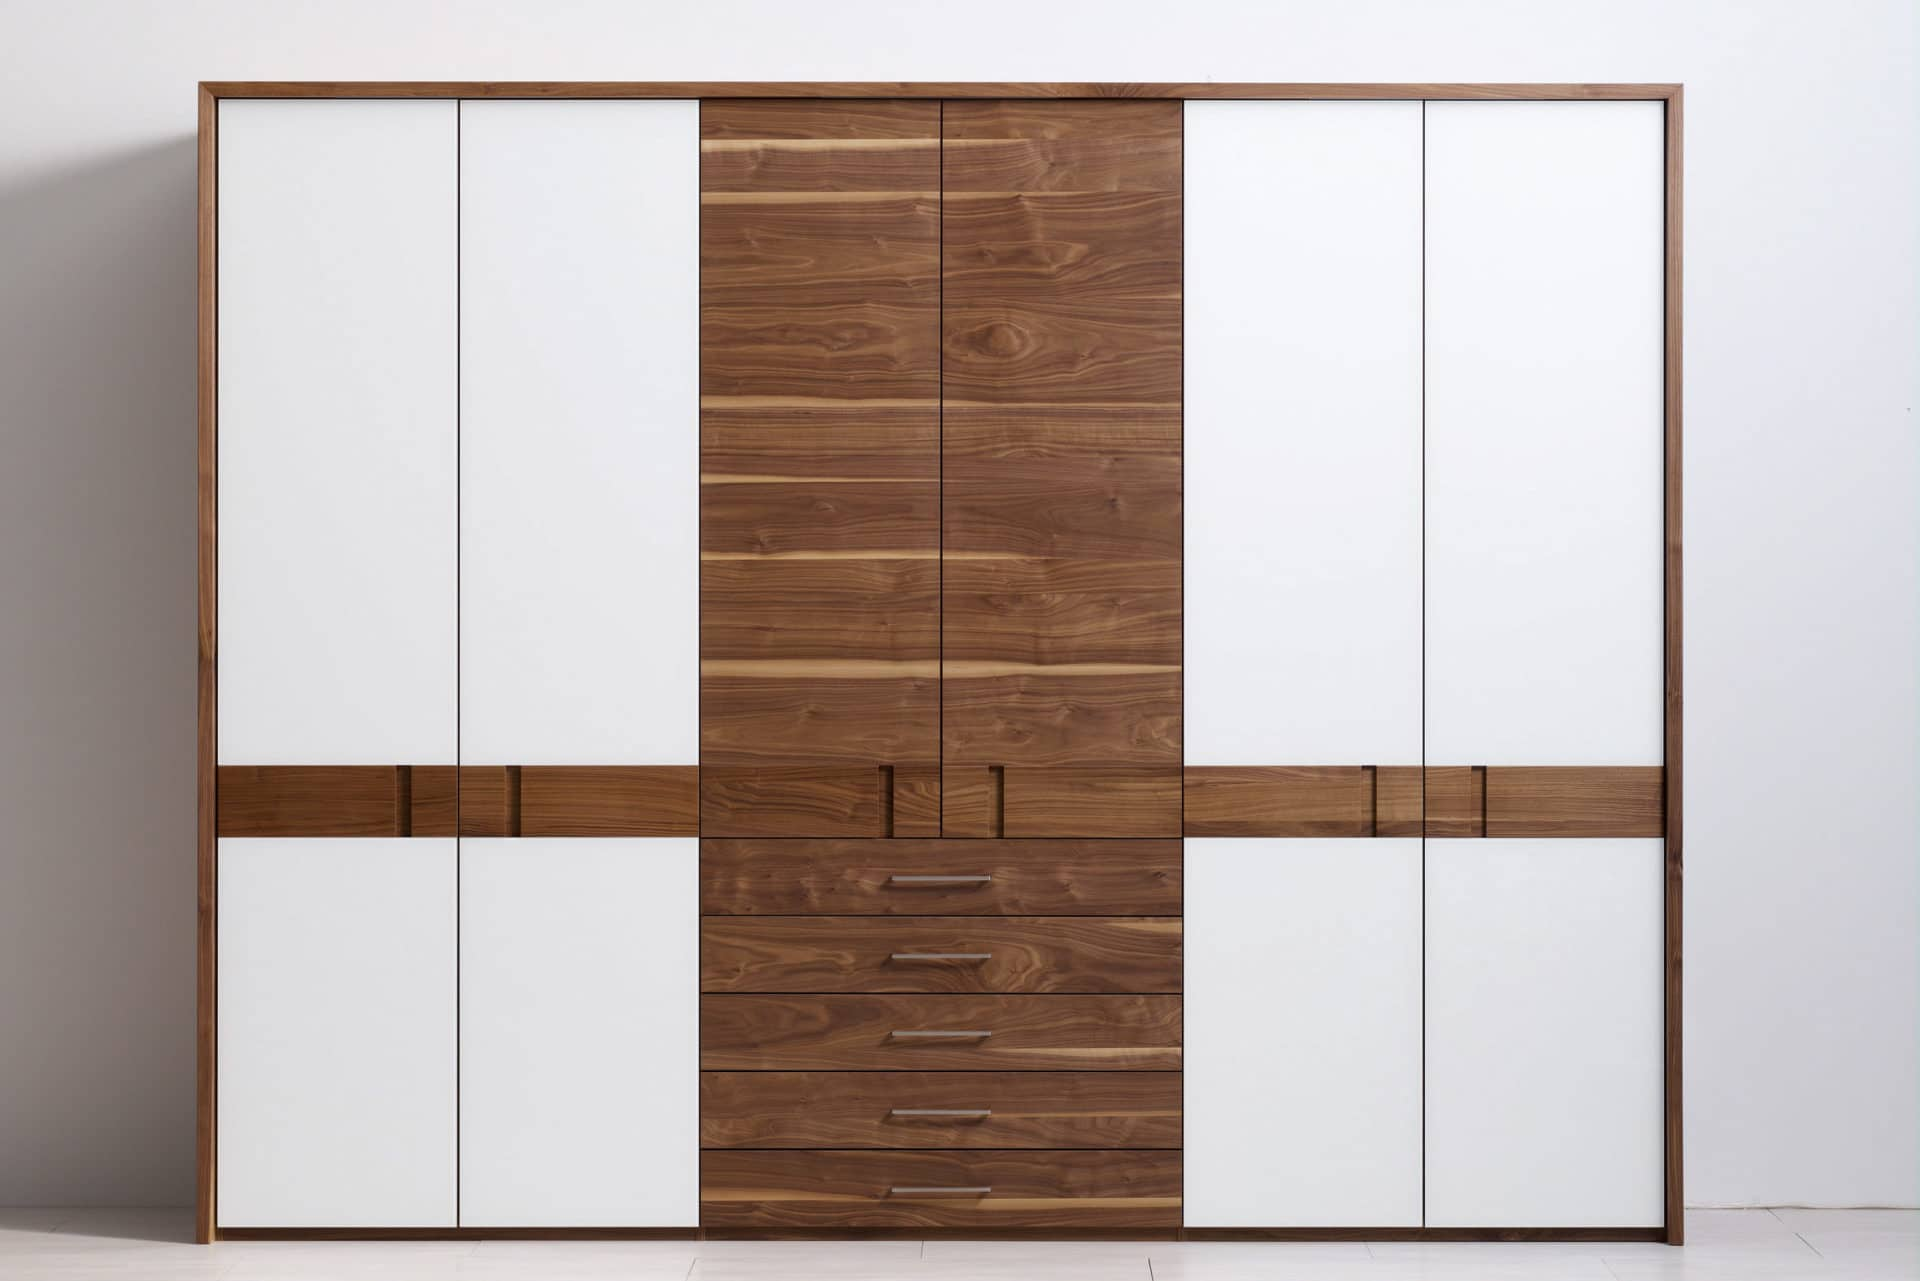 schrank rio mit glas in astnuss ko control. Black Bedroom Furniture Sets. Home Design Ideas